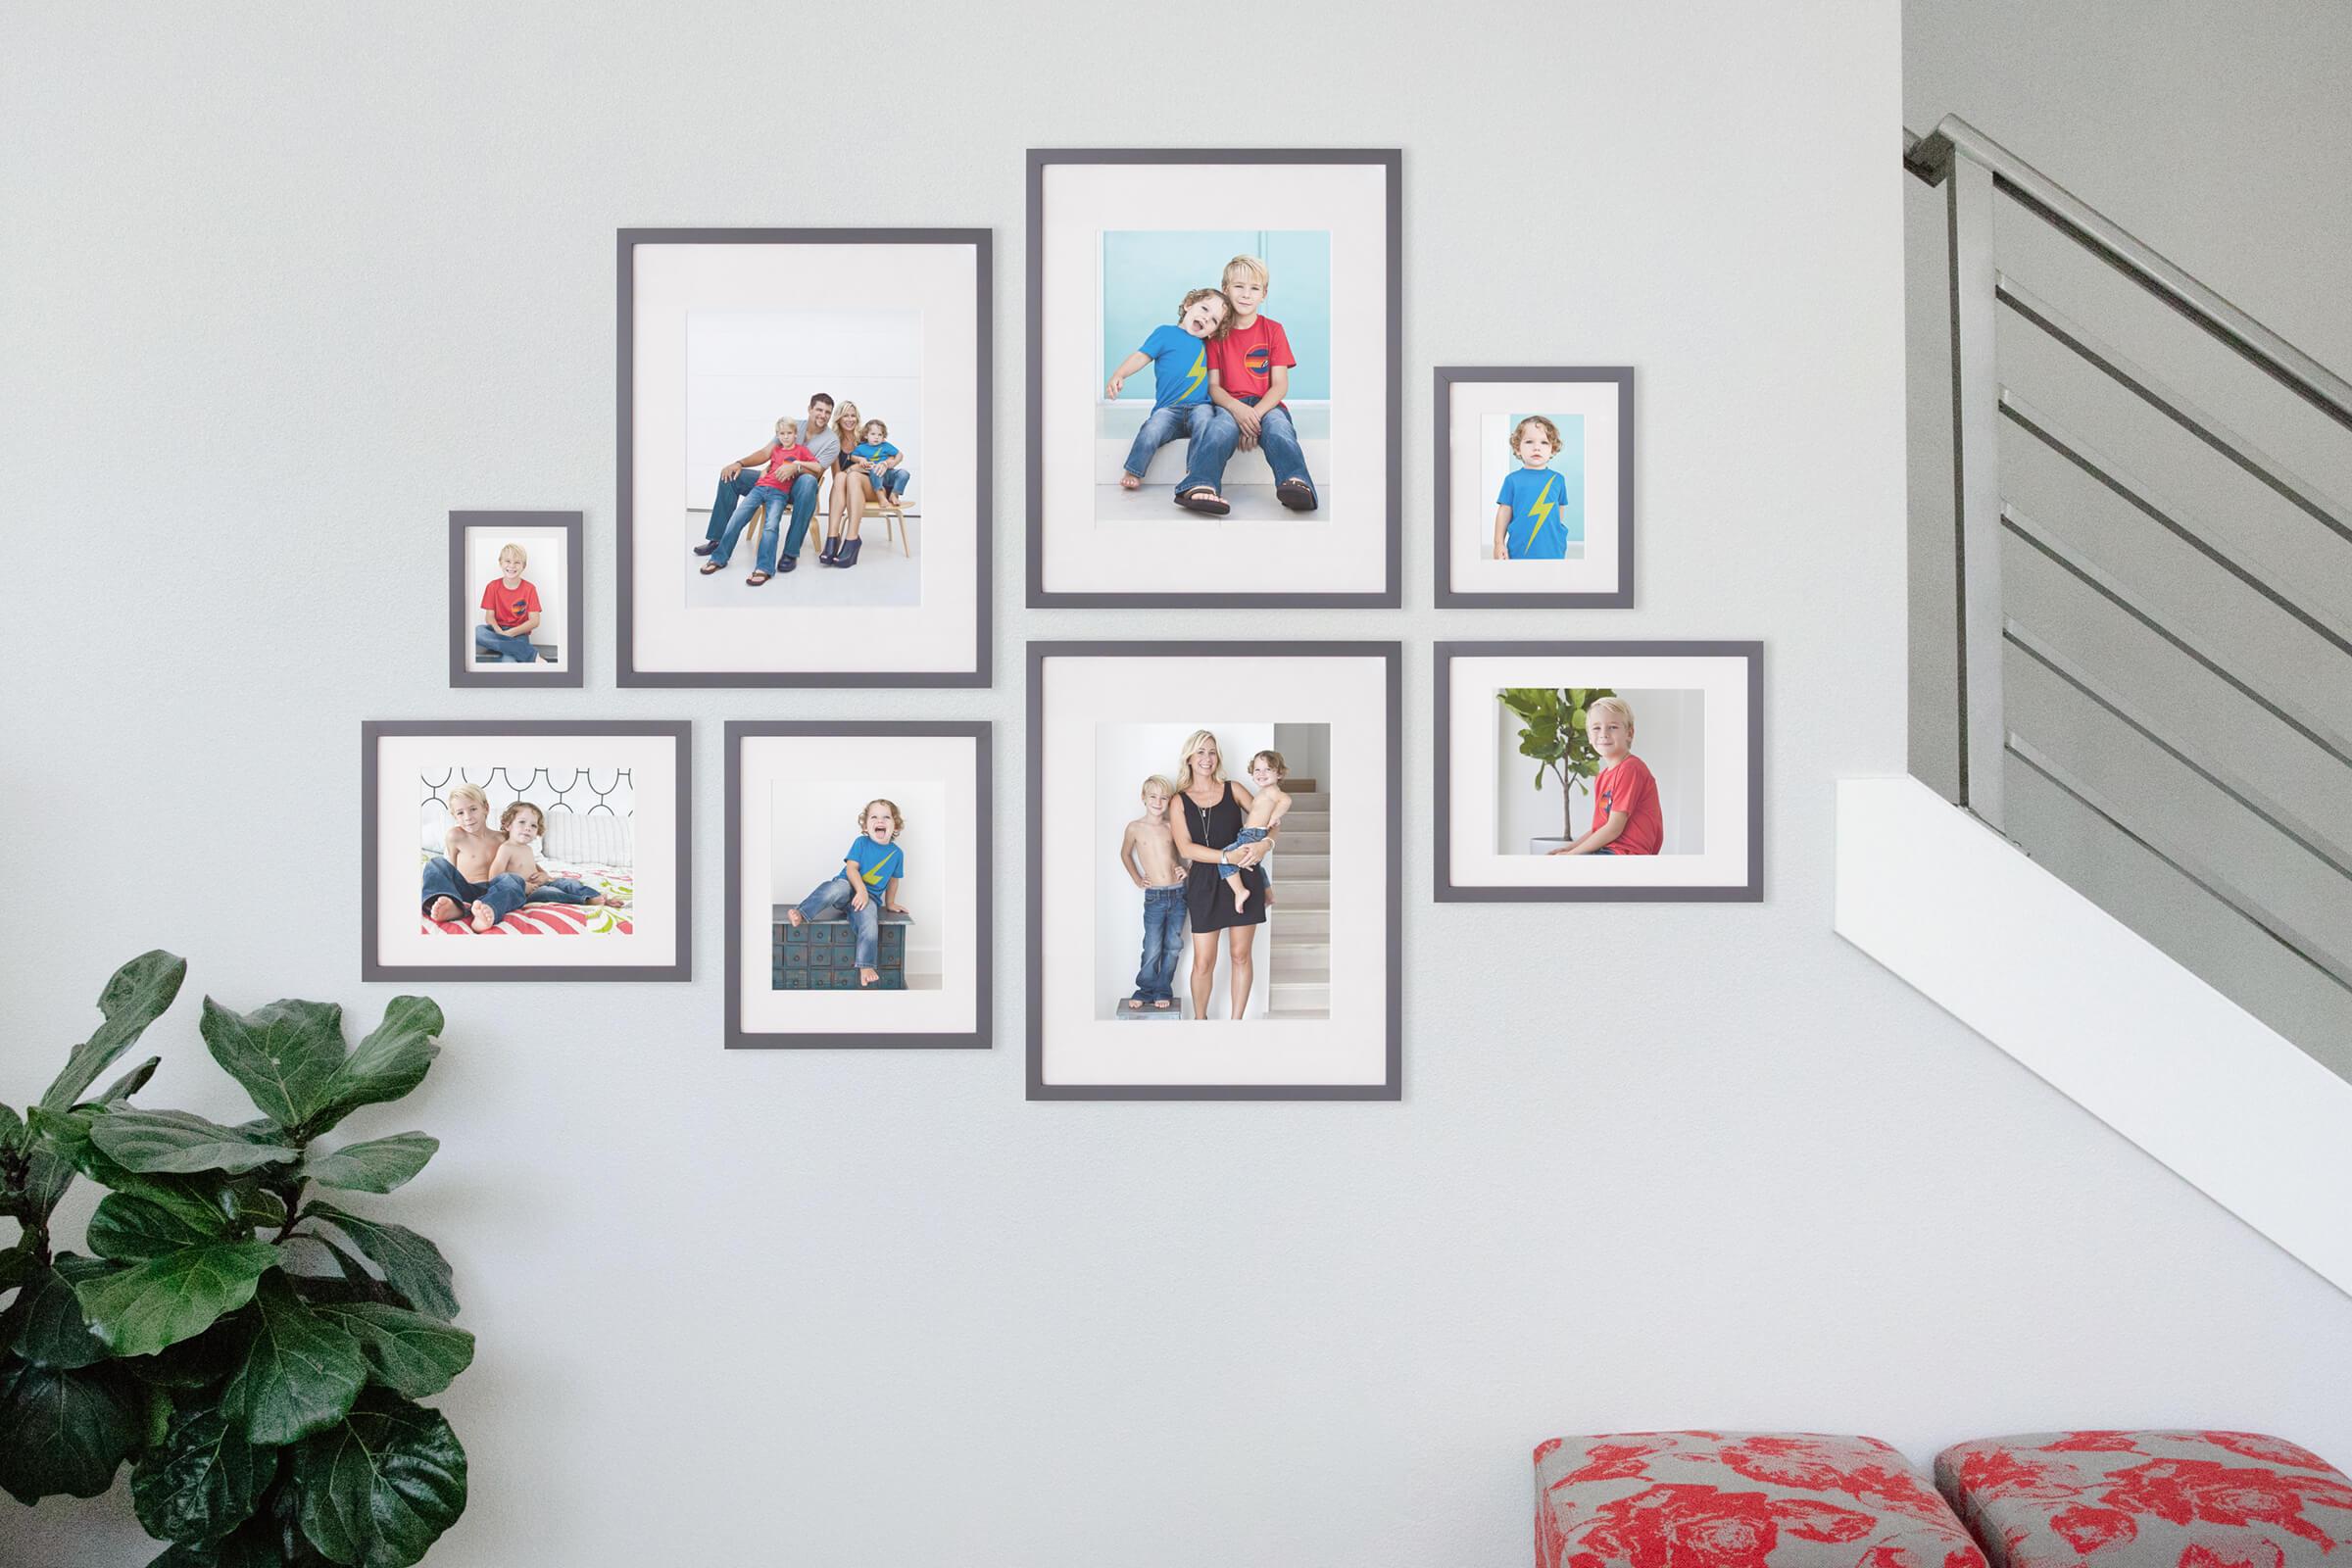 LHP_wall_gallery.jpg